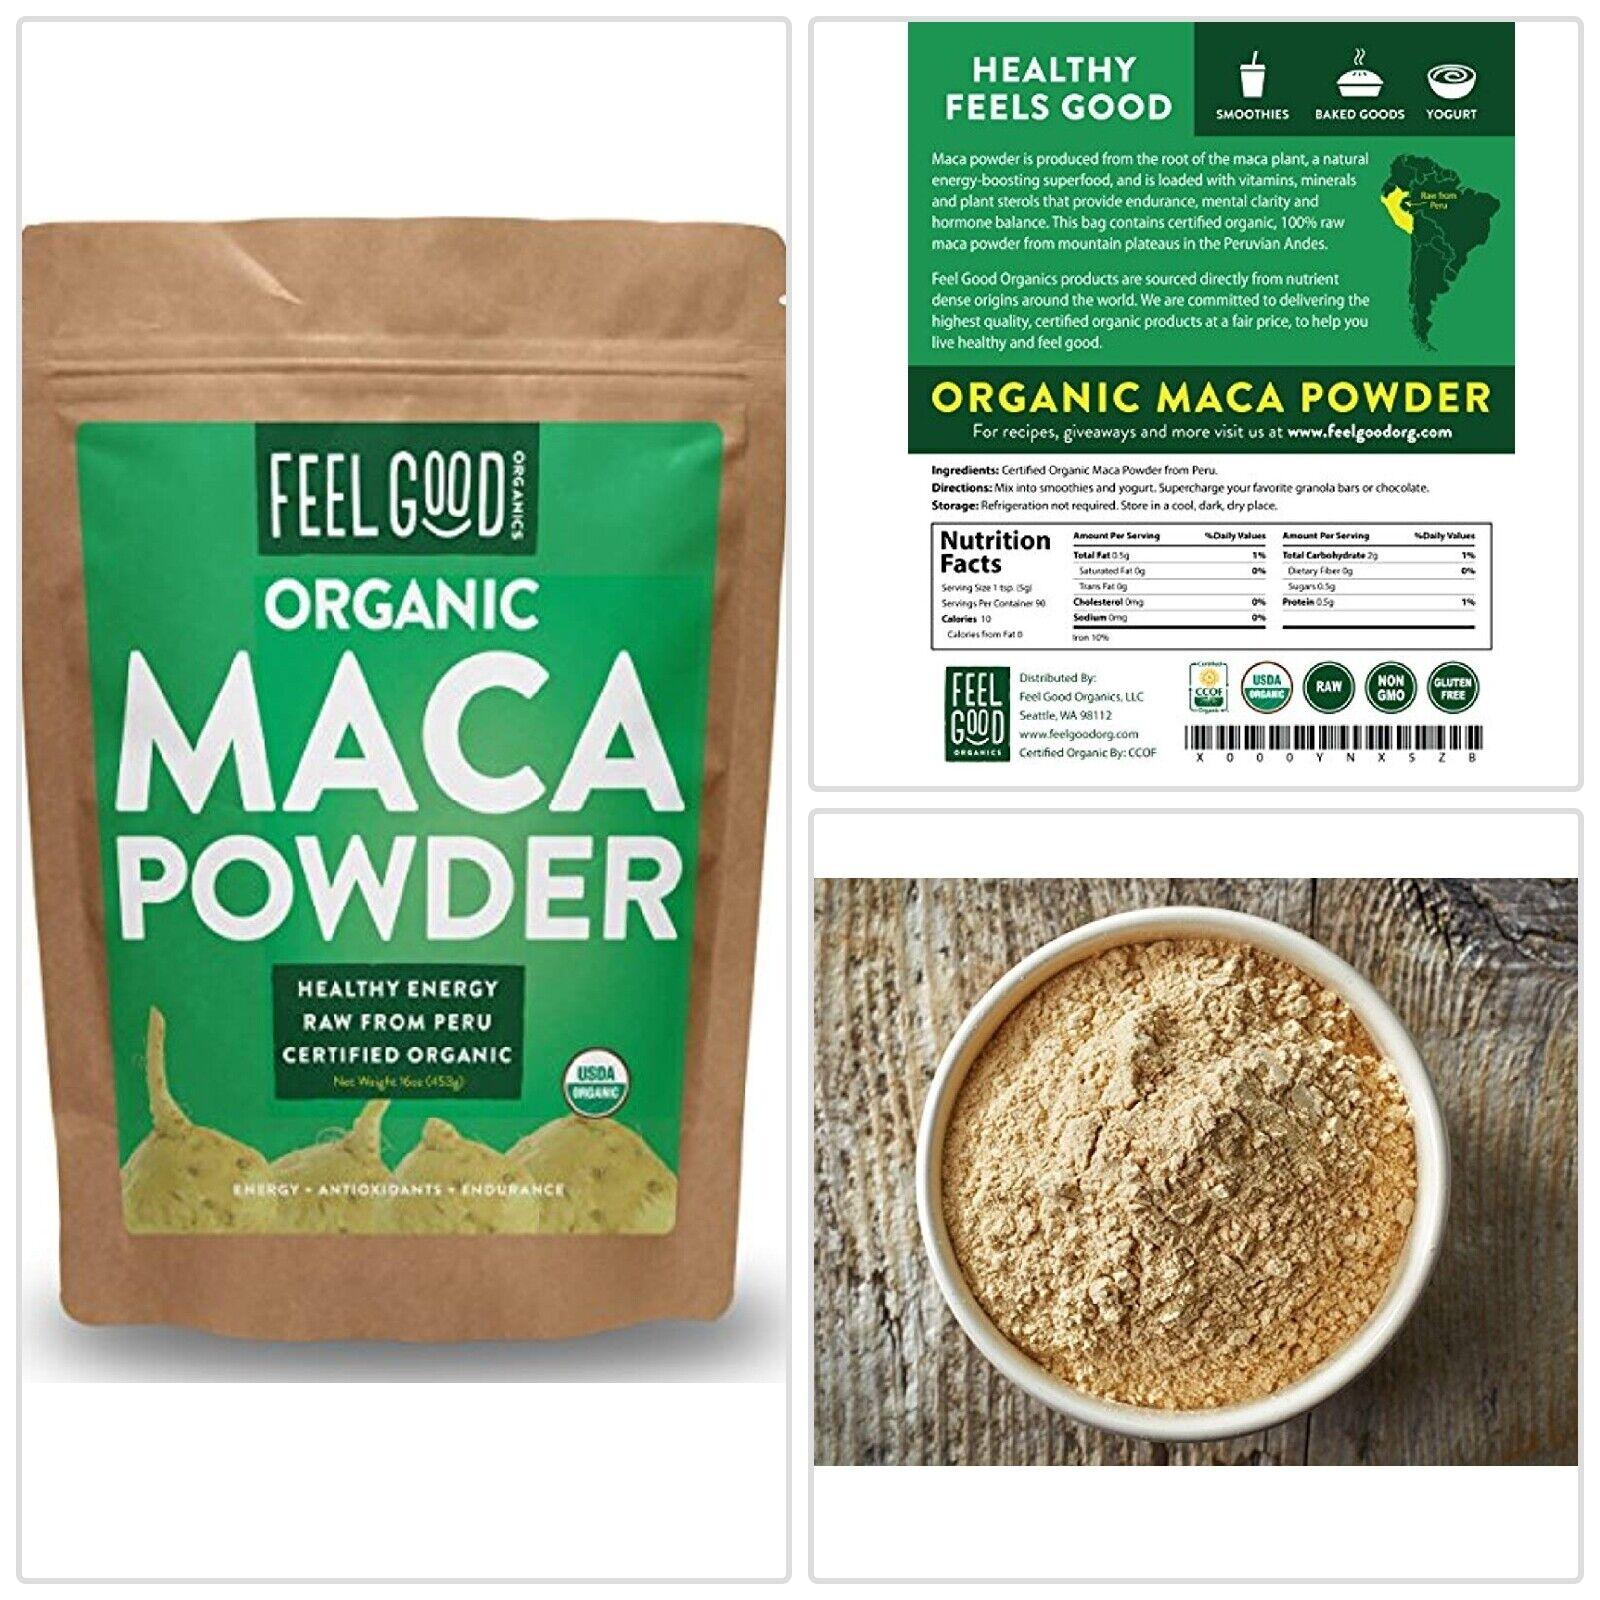 USDA Organic MACA ROOT Powder Peruvian Raw From Peru 16oz by